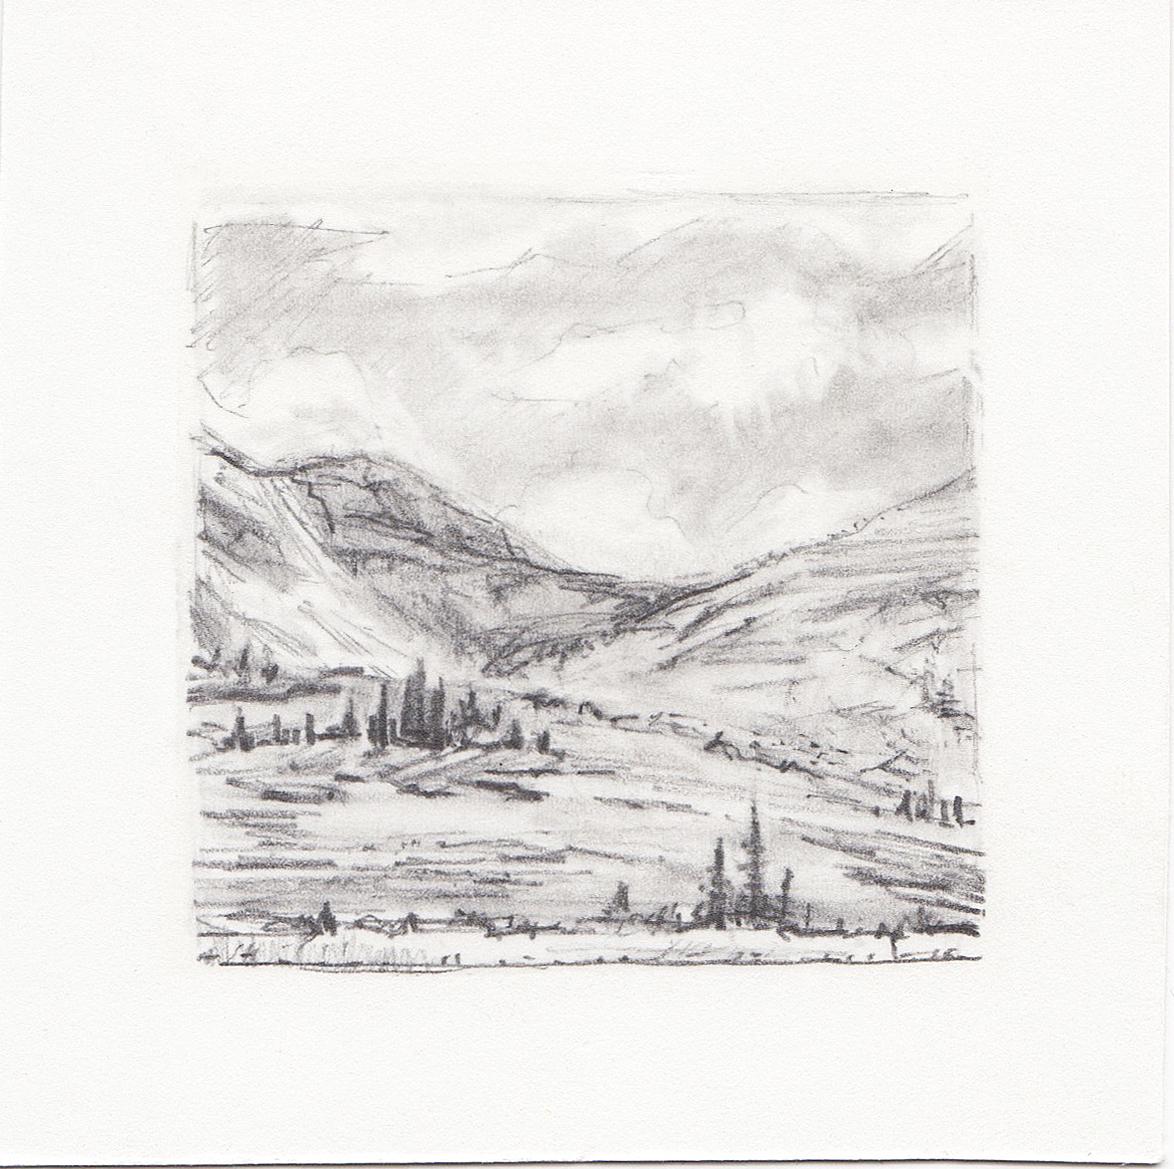 #52 Uinta Mountains, Utah | 3x3 | graphite